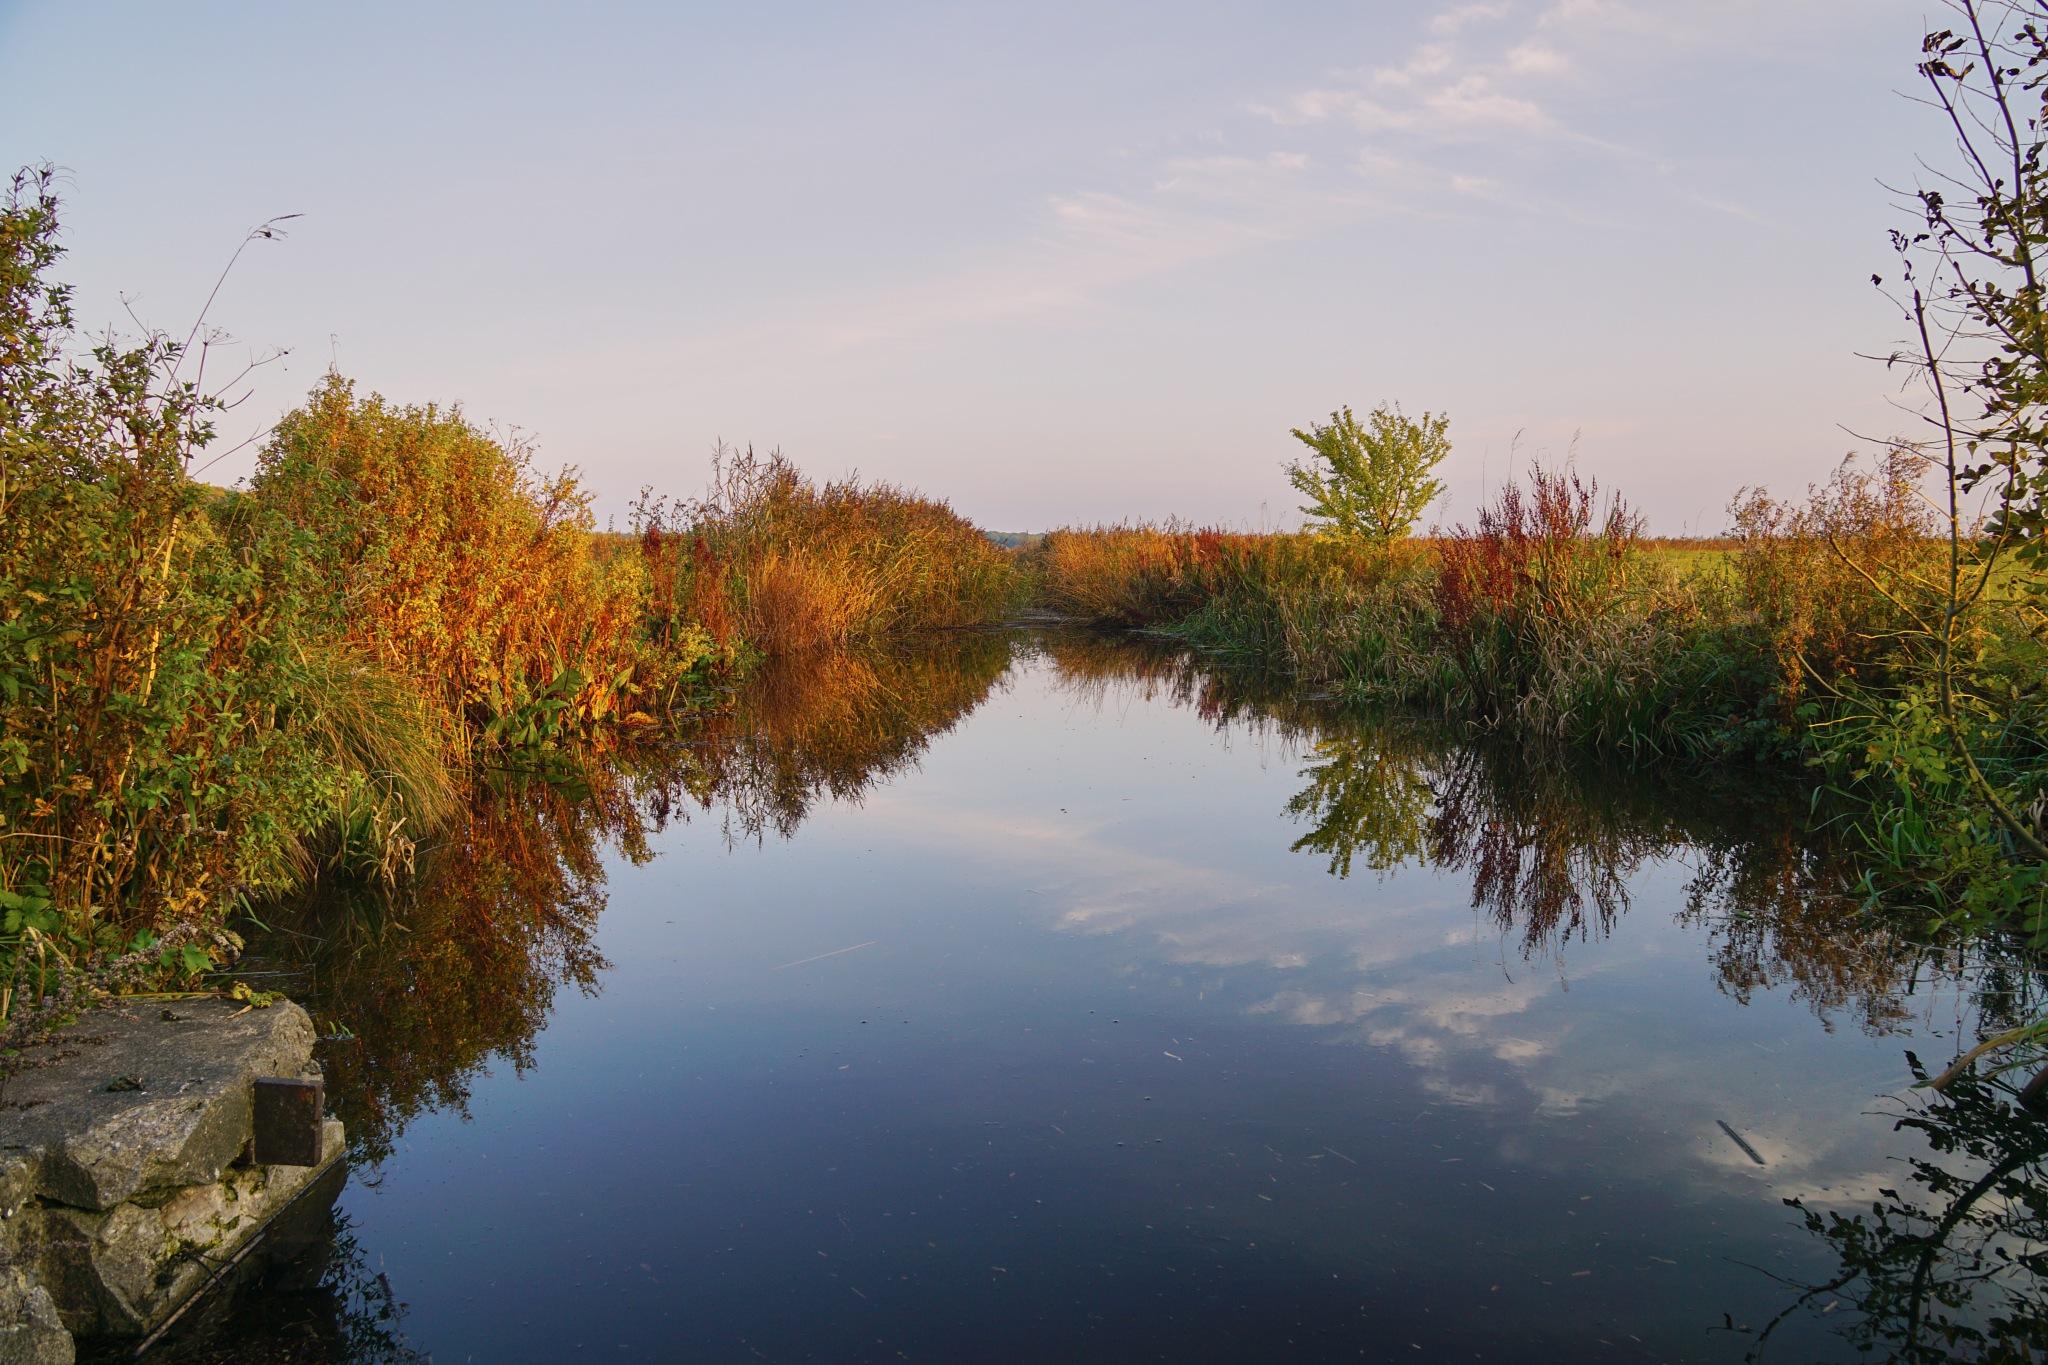 Stream in autumn colors by Dorte Hedengran